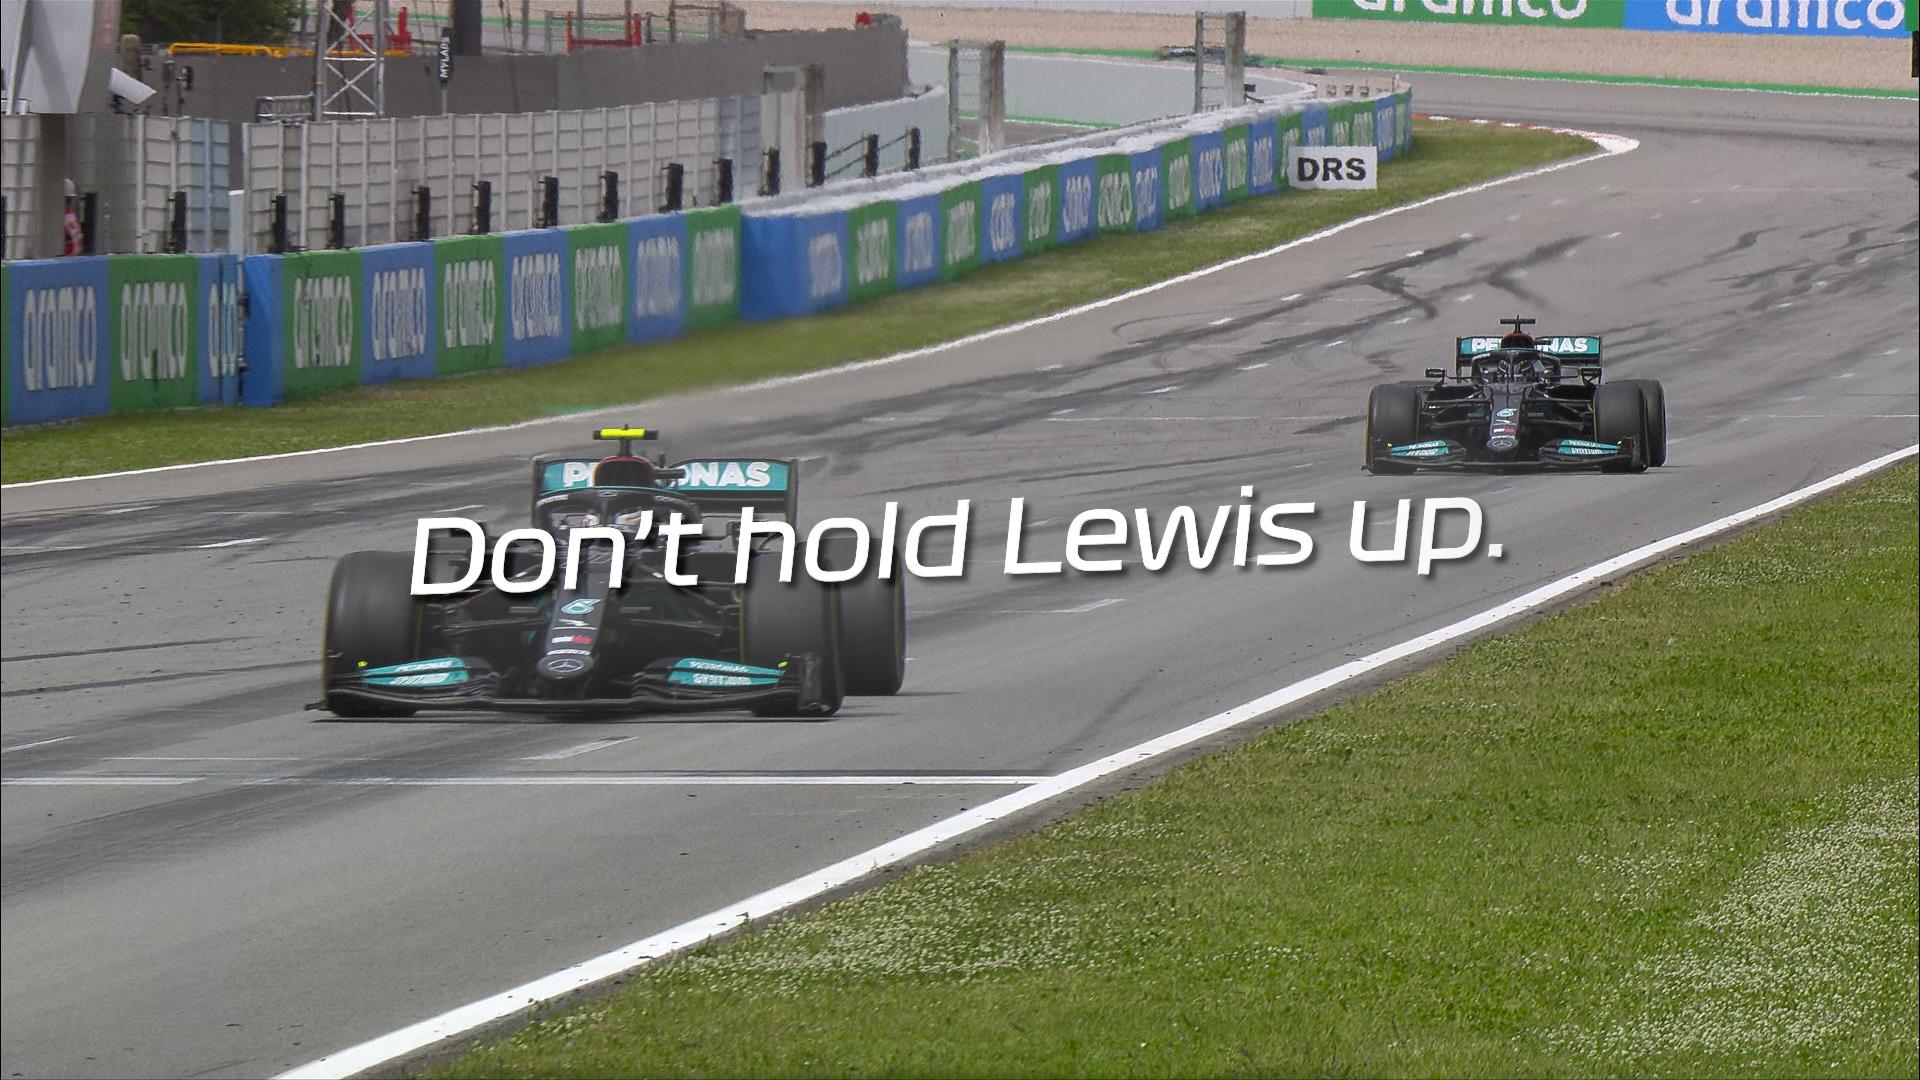 2021 Spanish Grand Prix: Bottas resists team orders to force Hamilton overtake